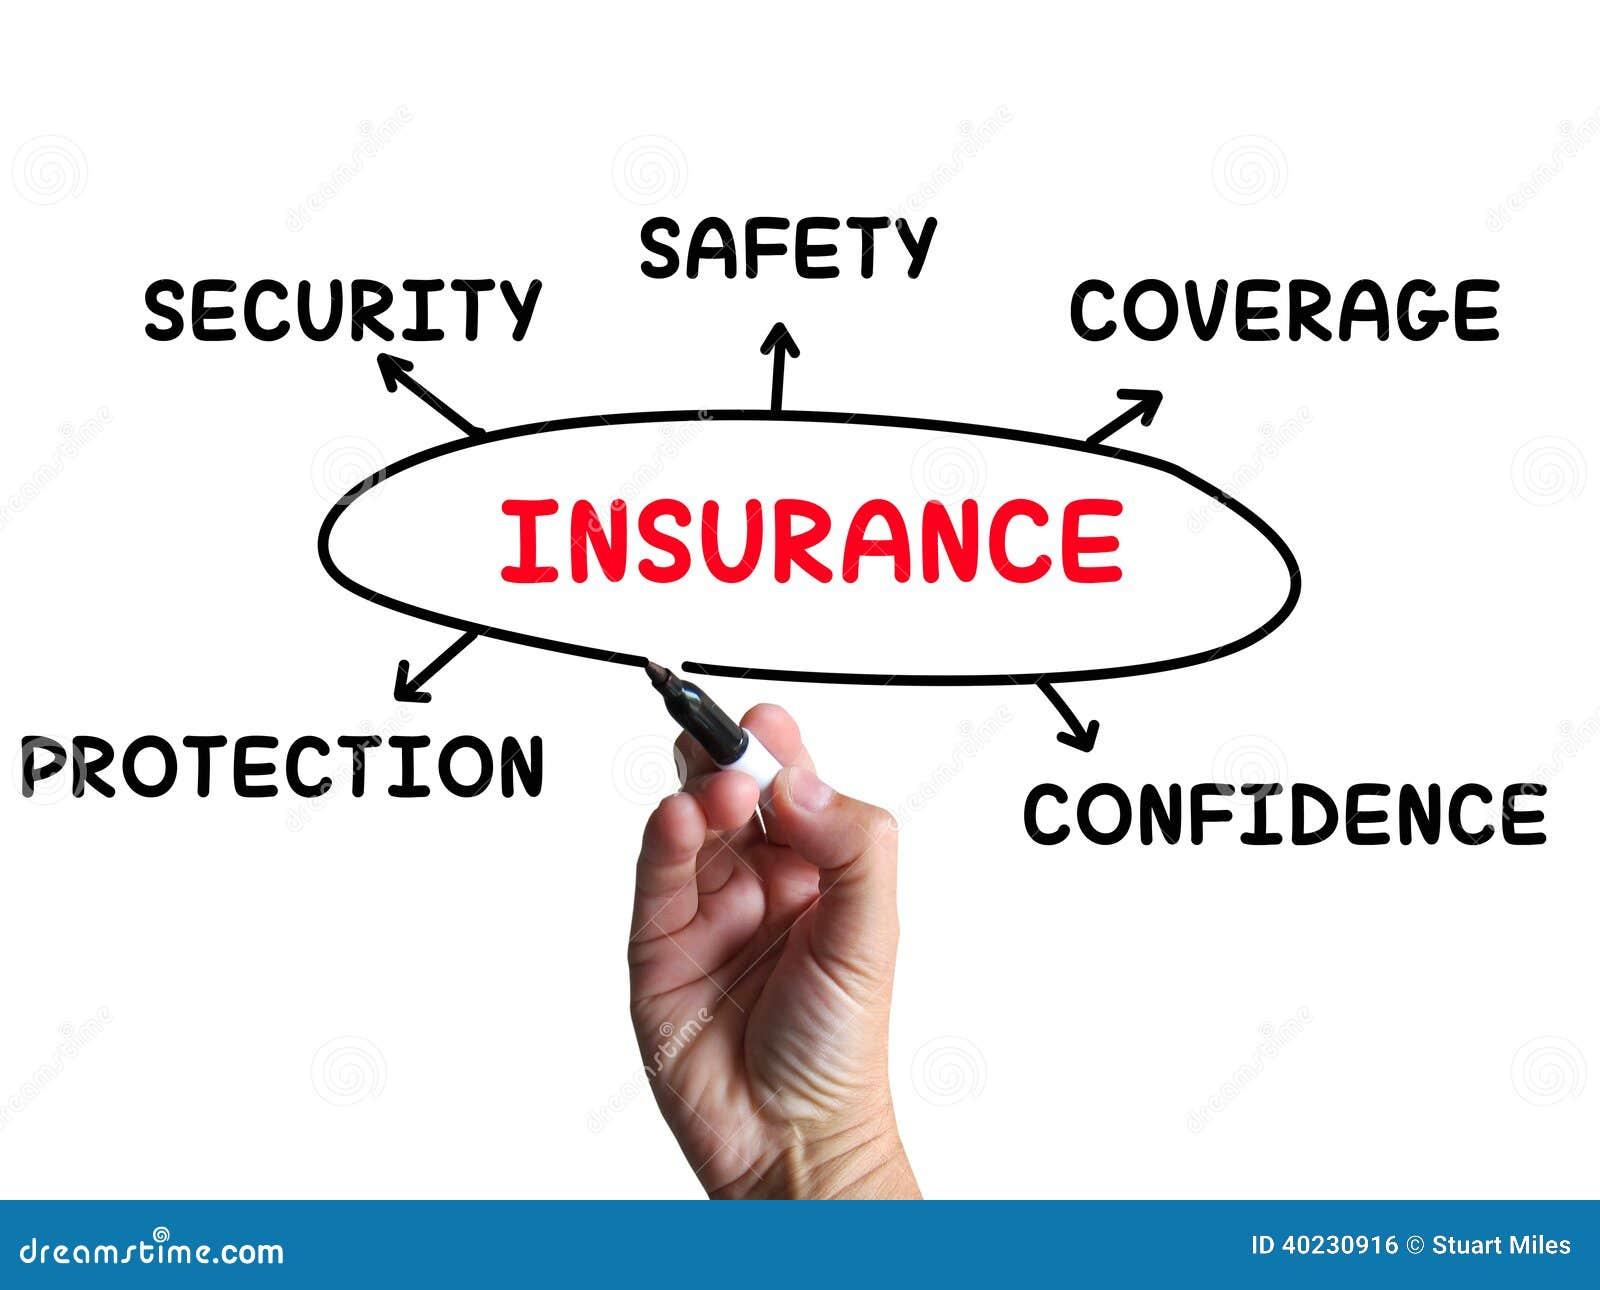 How To Explain Car Insurance